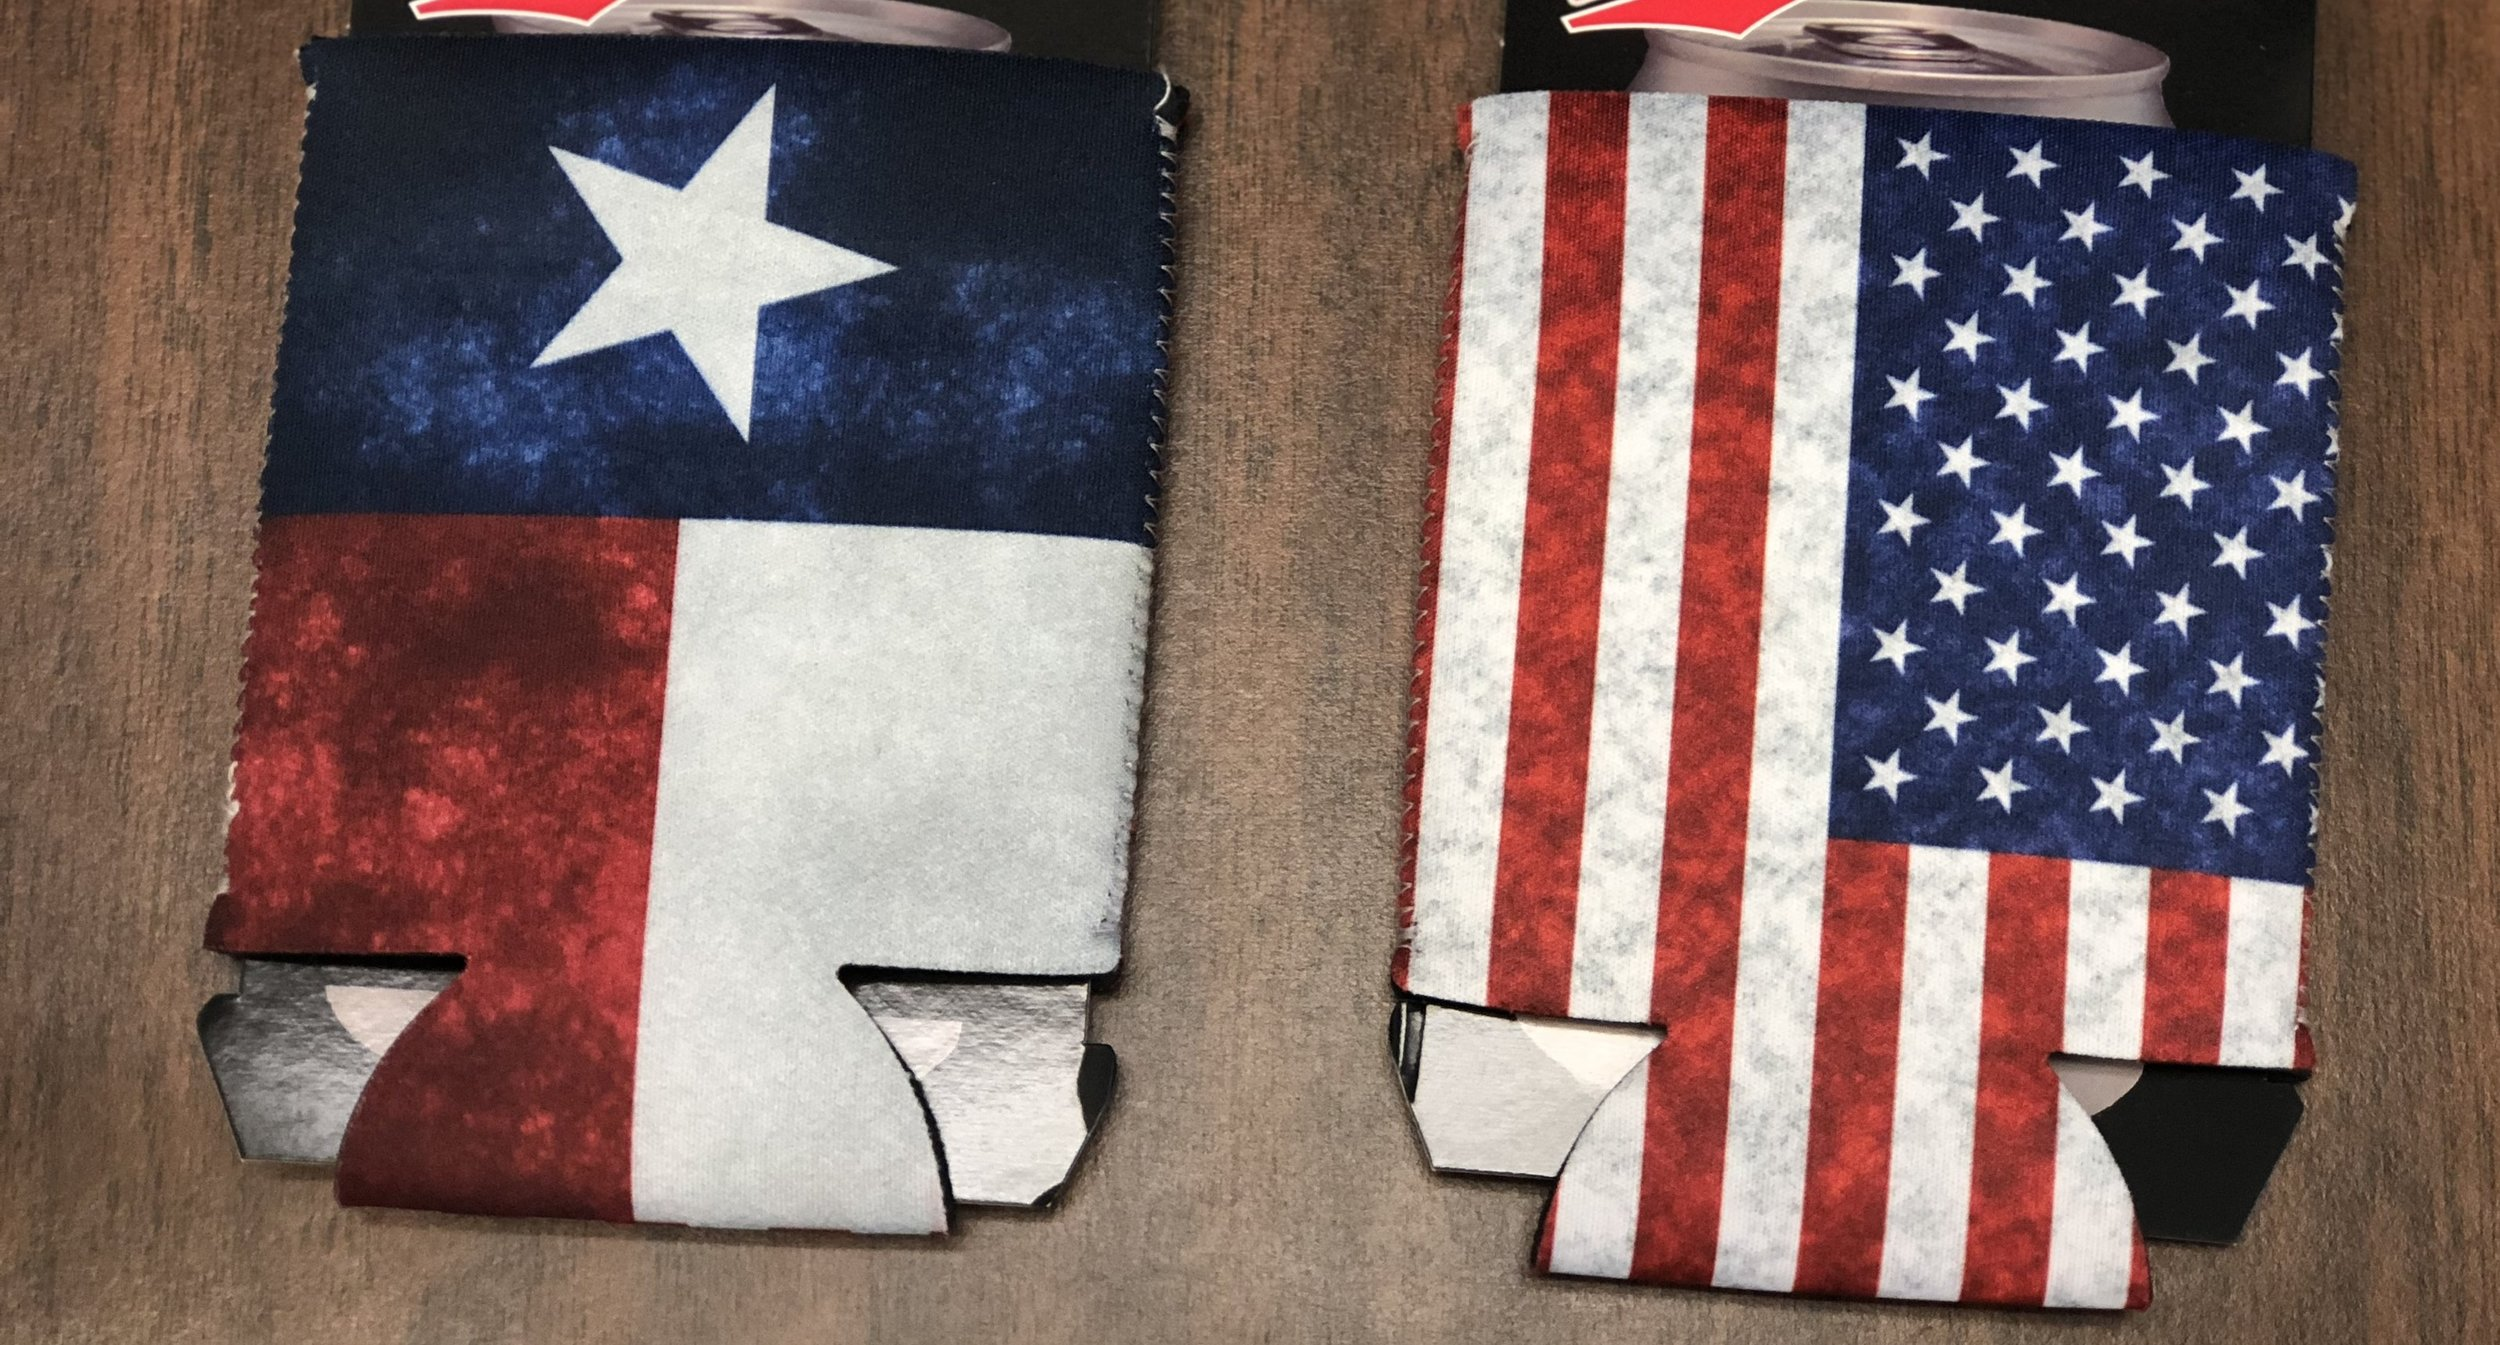 TEXAS/AMERICAN FLAG POCKET KOOZIE, 576 PIECES